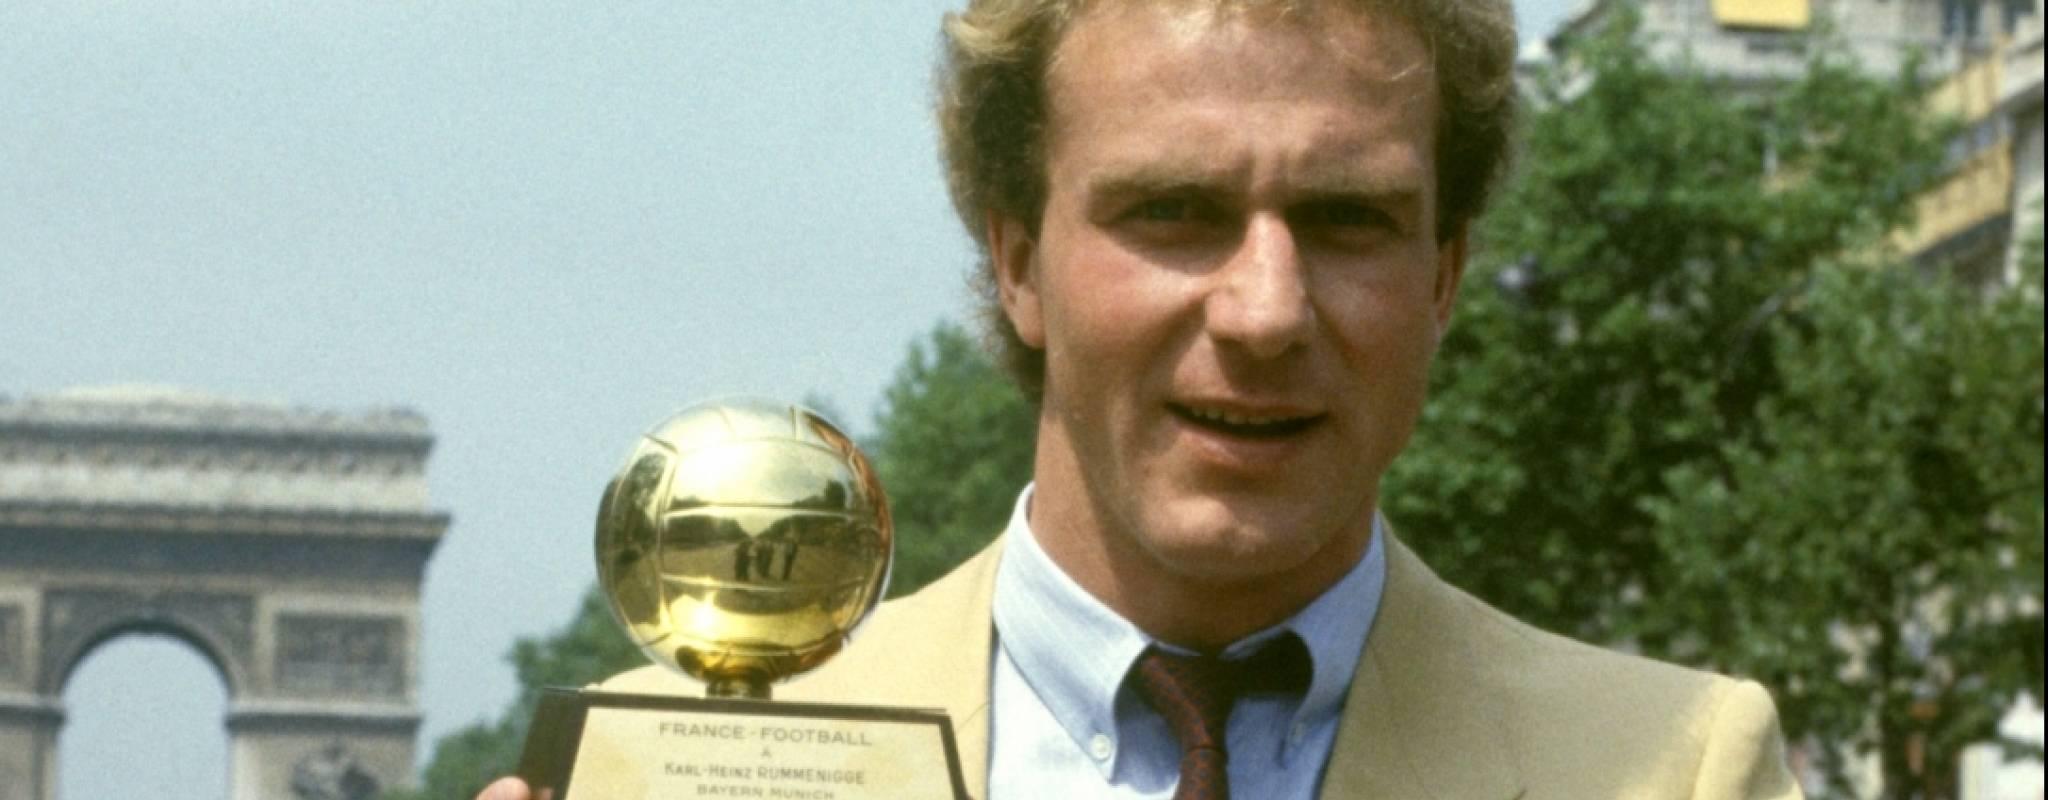 Rummenigge won two Ballon d'Or